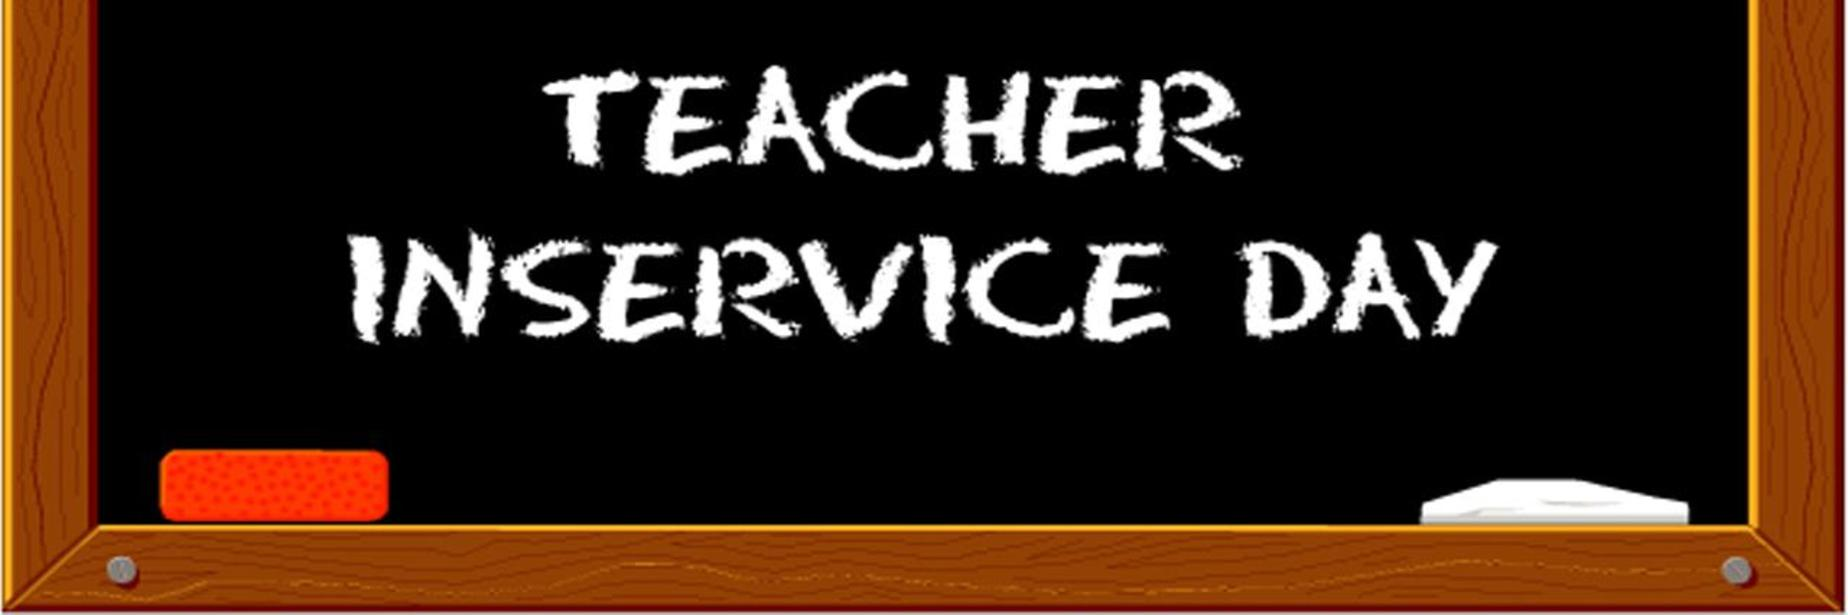 Teacher Inservice Day